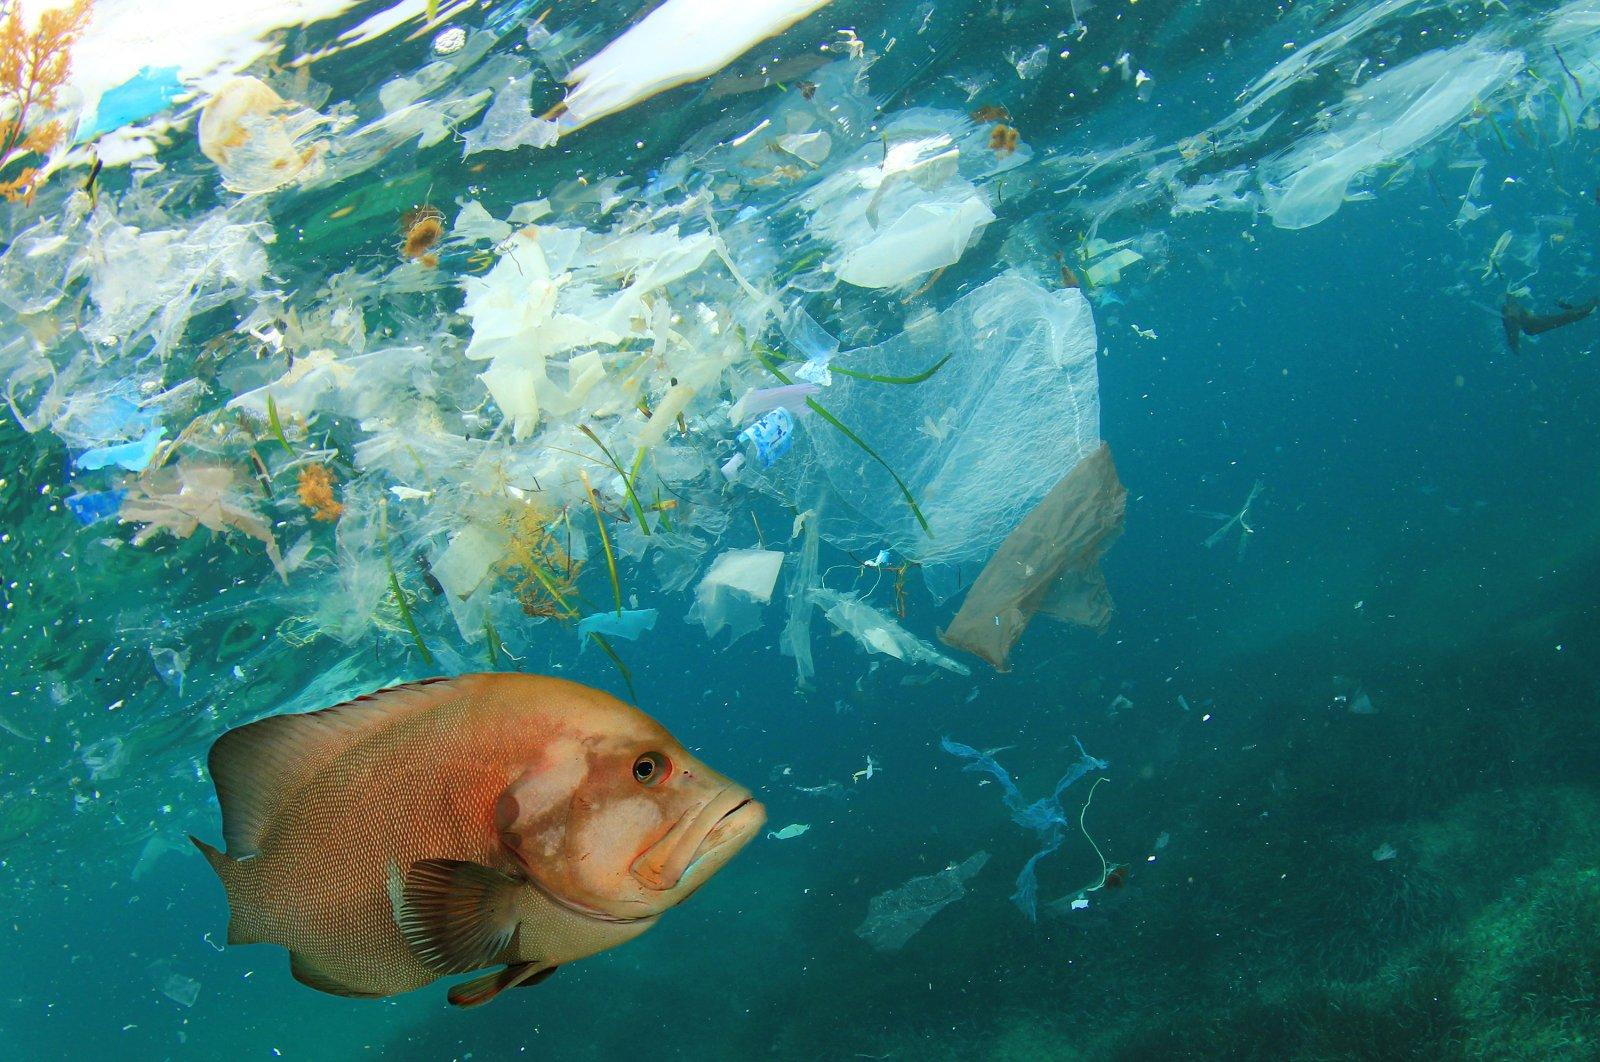 A fish swimming in a sea of plastic (Shutterstock Photo)